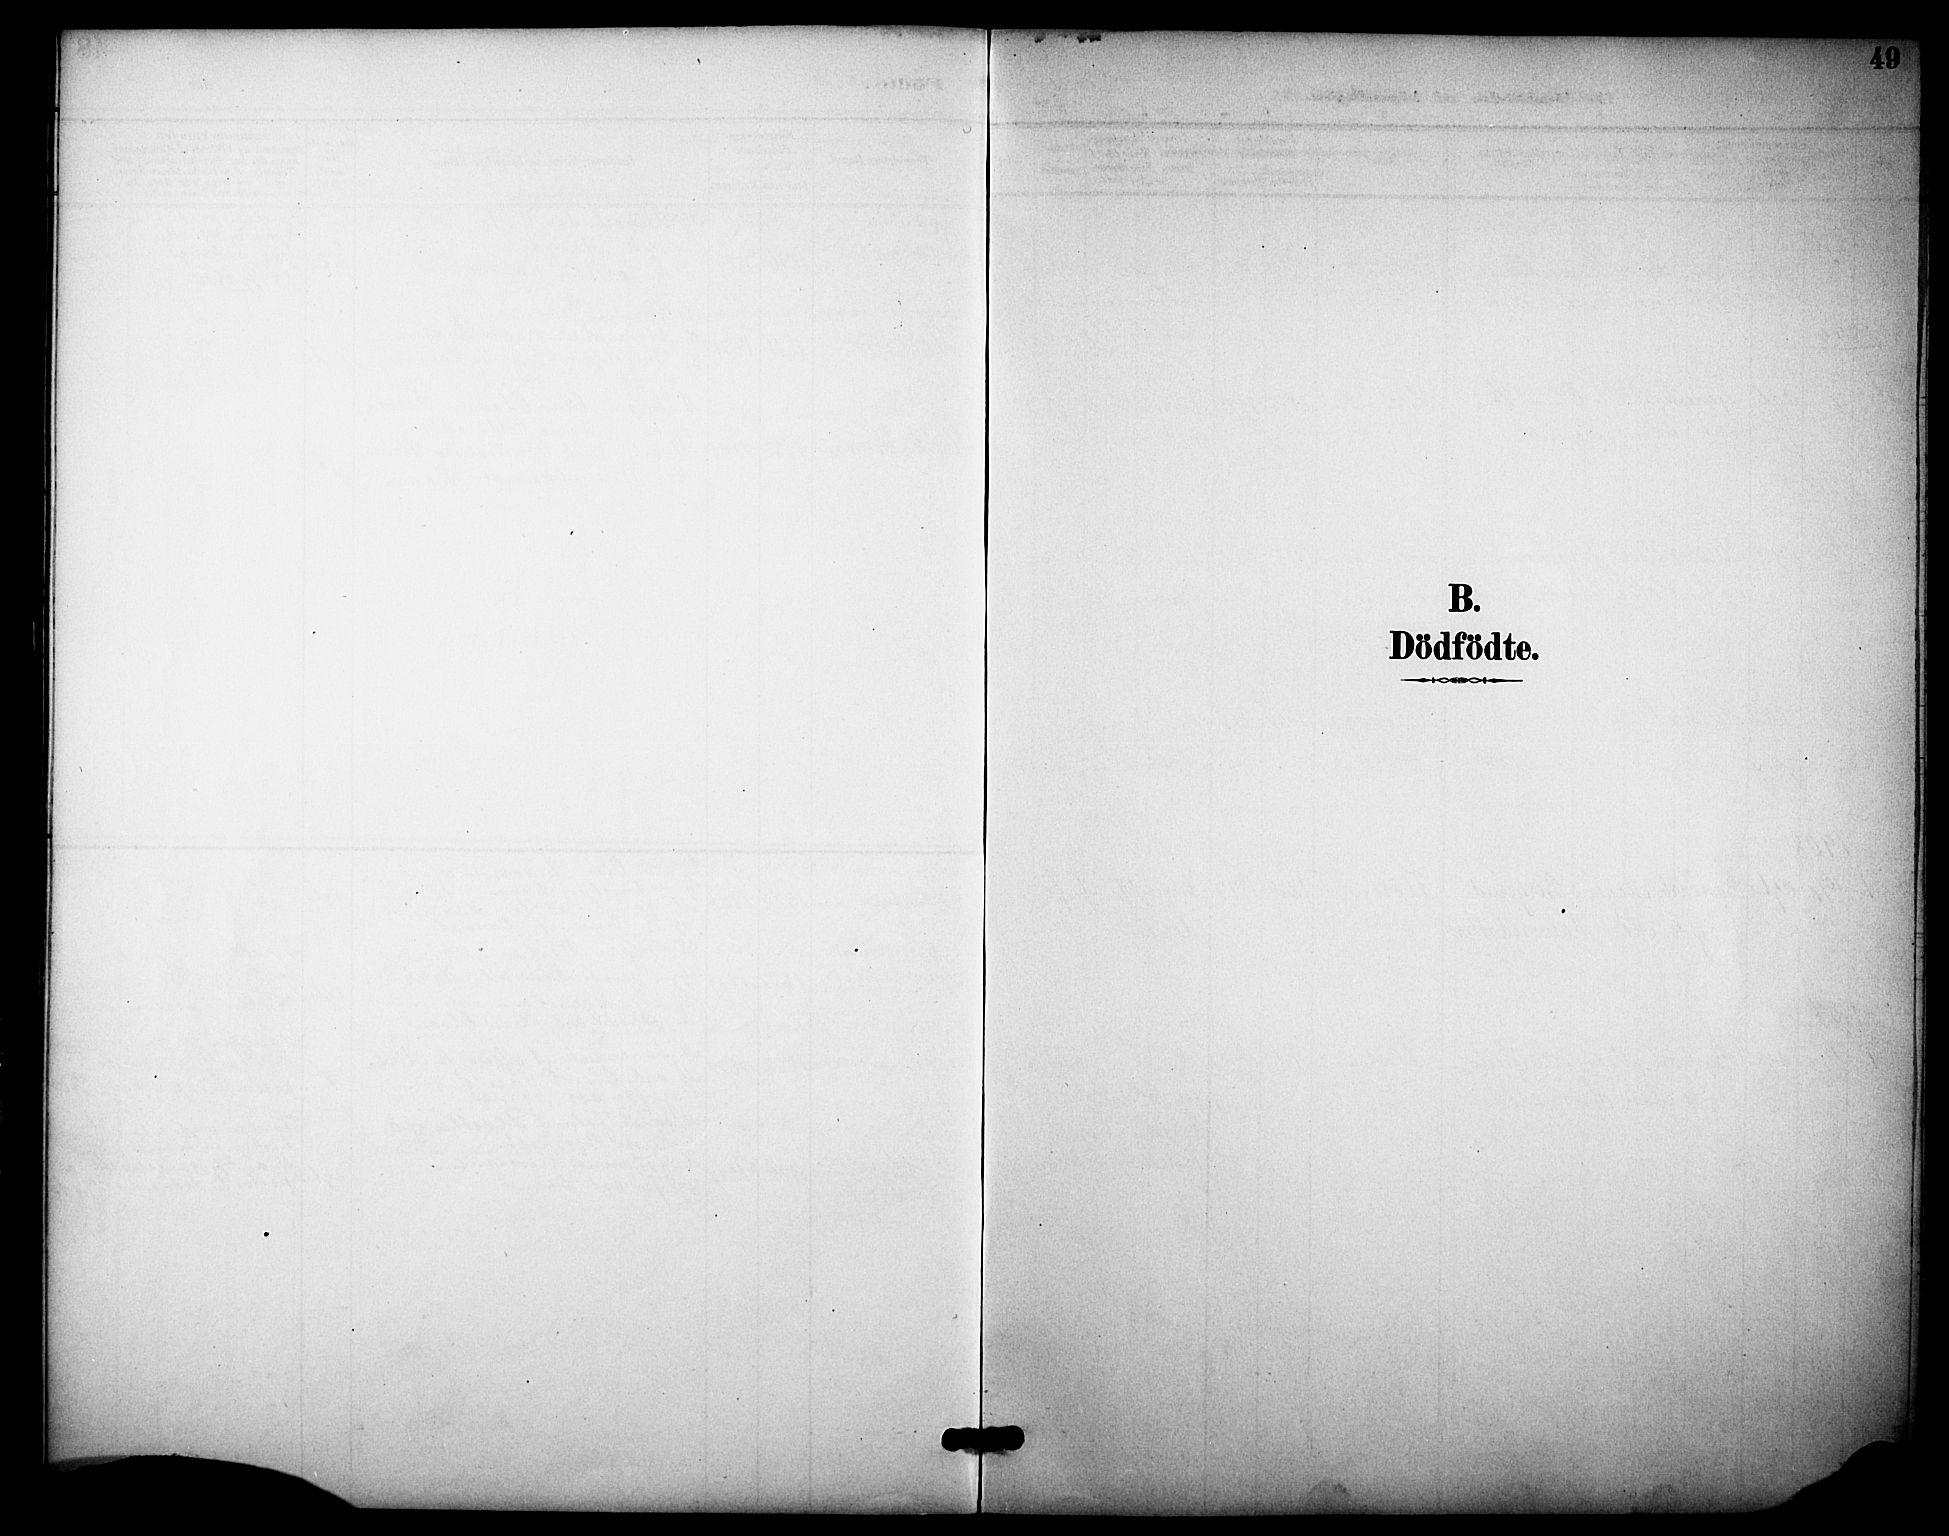 SAKO, Heddal kirkebøker, F/Fb/L0001: Ministerialbok nr. II 1, 1884-1910, s. 49